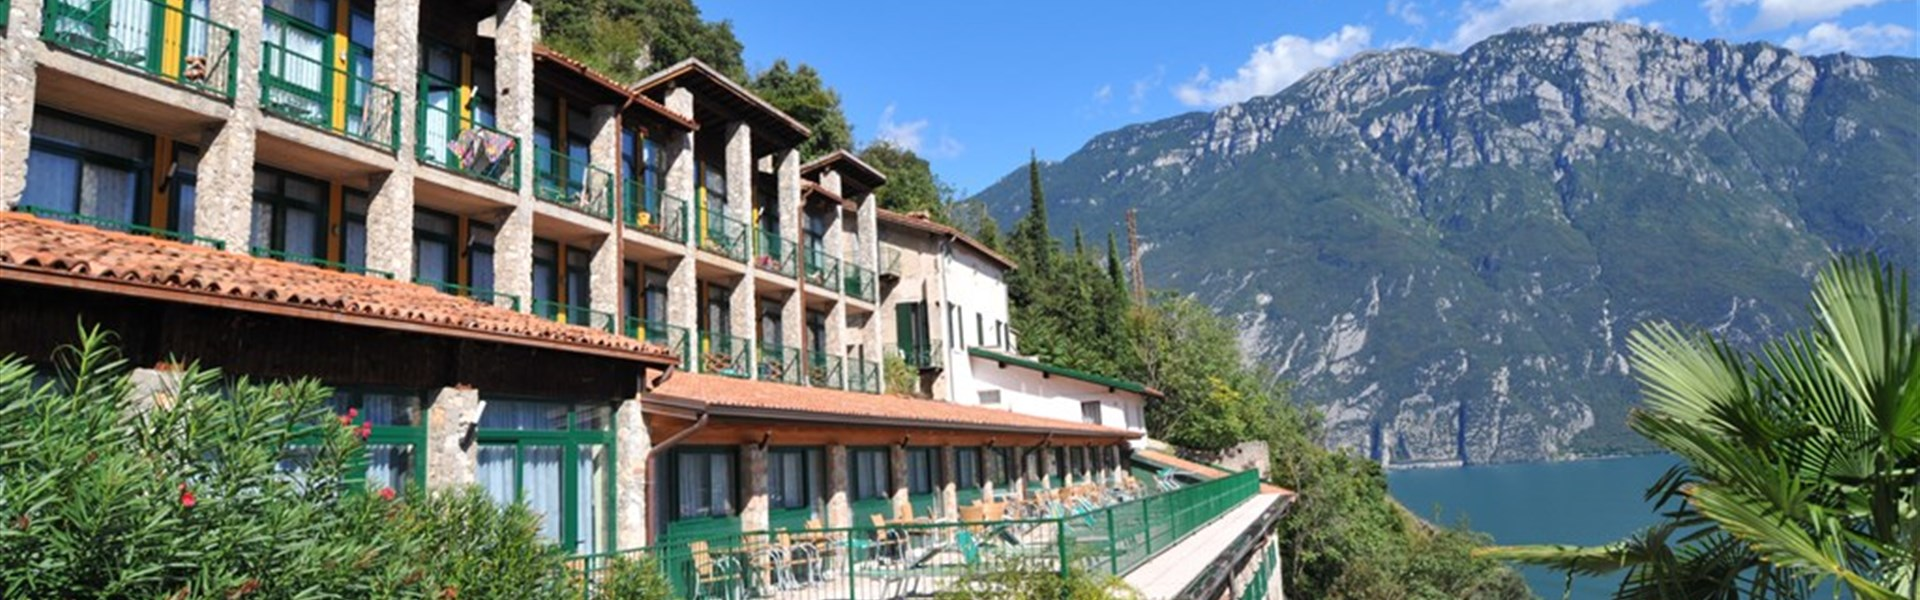 Marco Polo - Hotel La Limonaia -